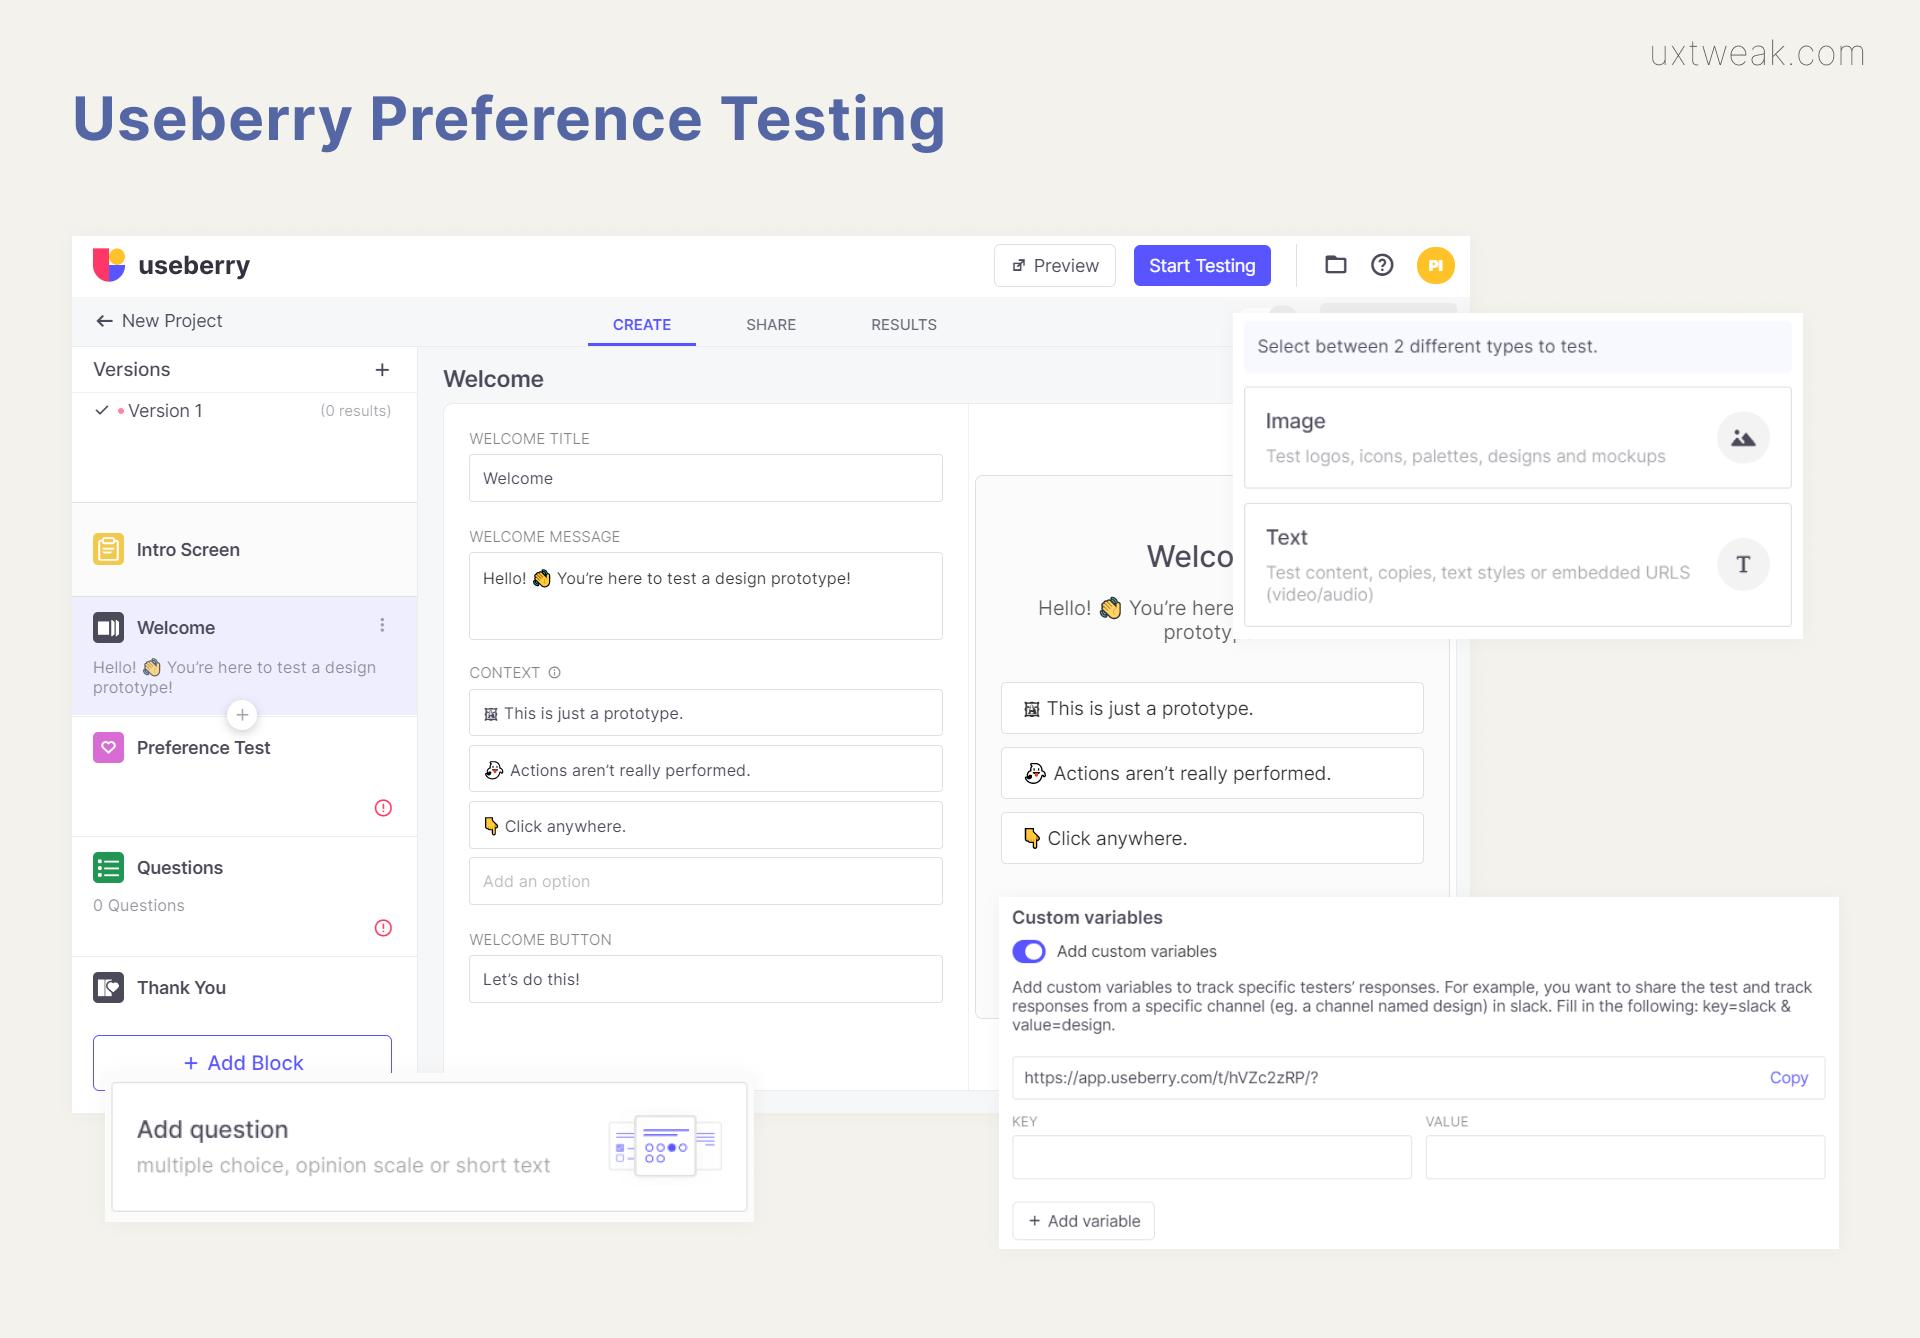 Useberry preference testing tool